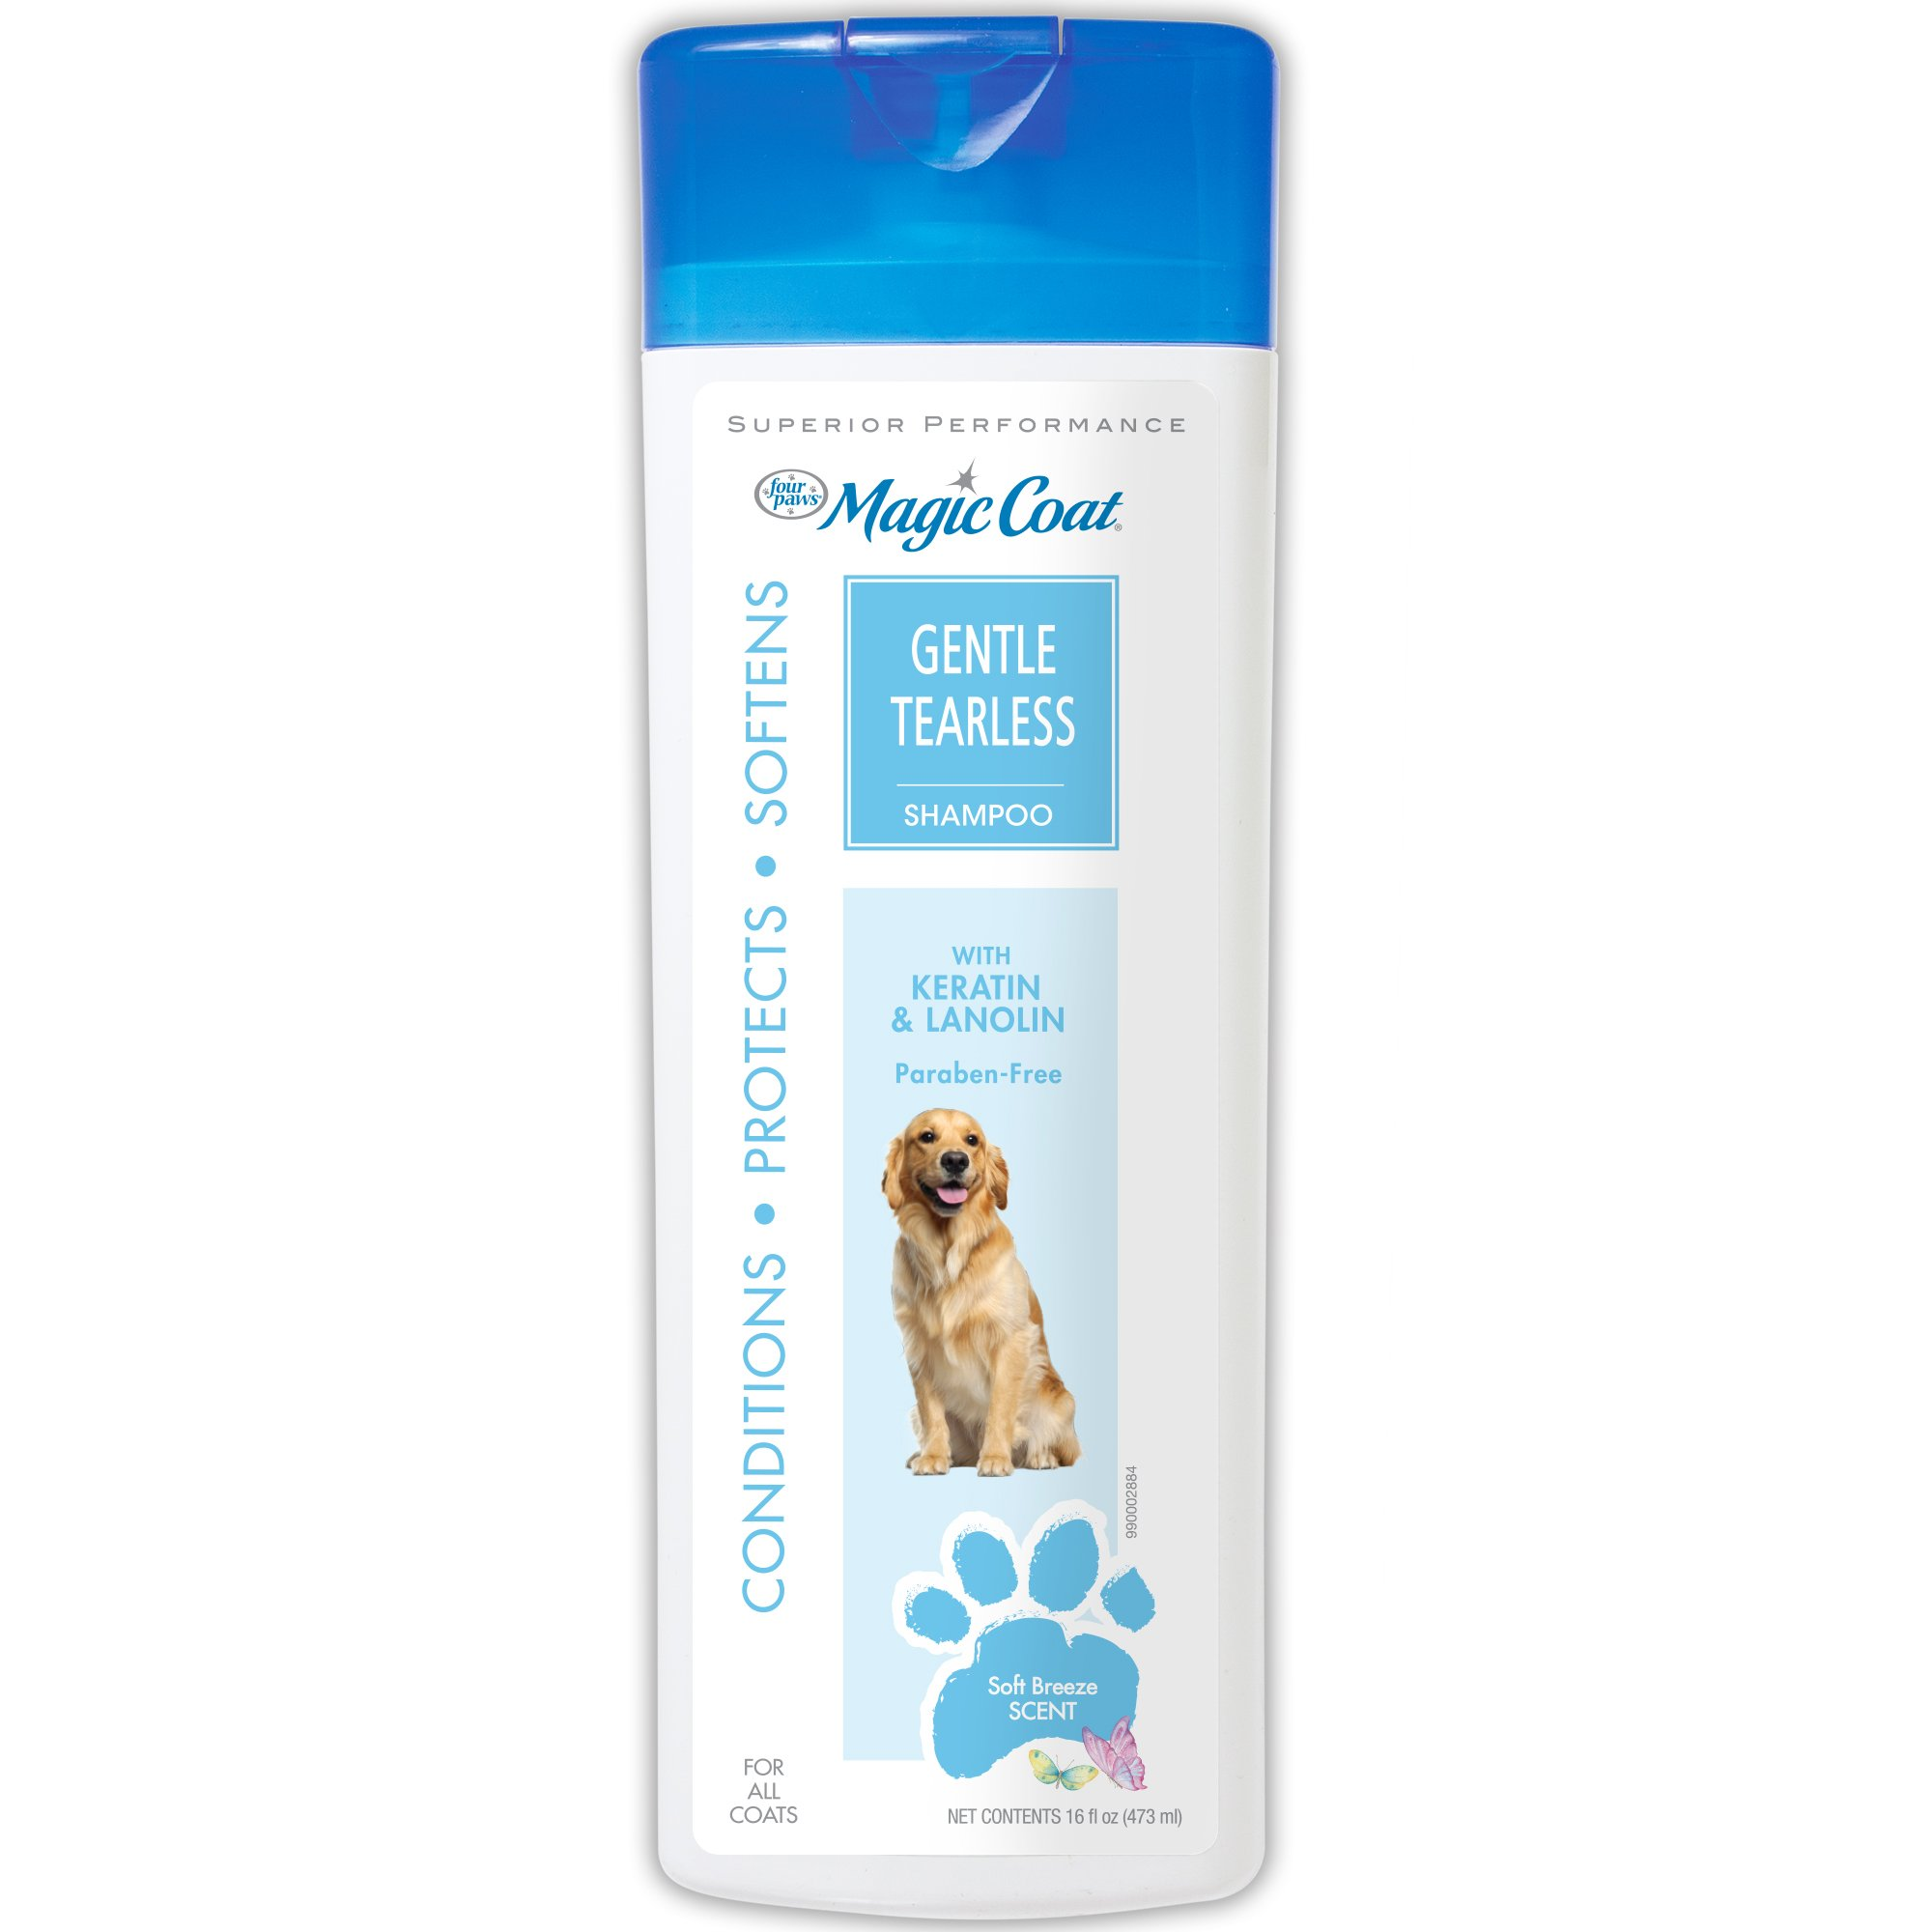 Four Paws Magic Coat Gentle Tearless Dog Shampoo